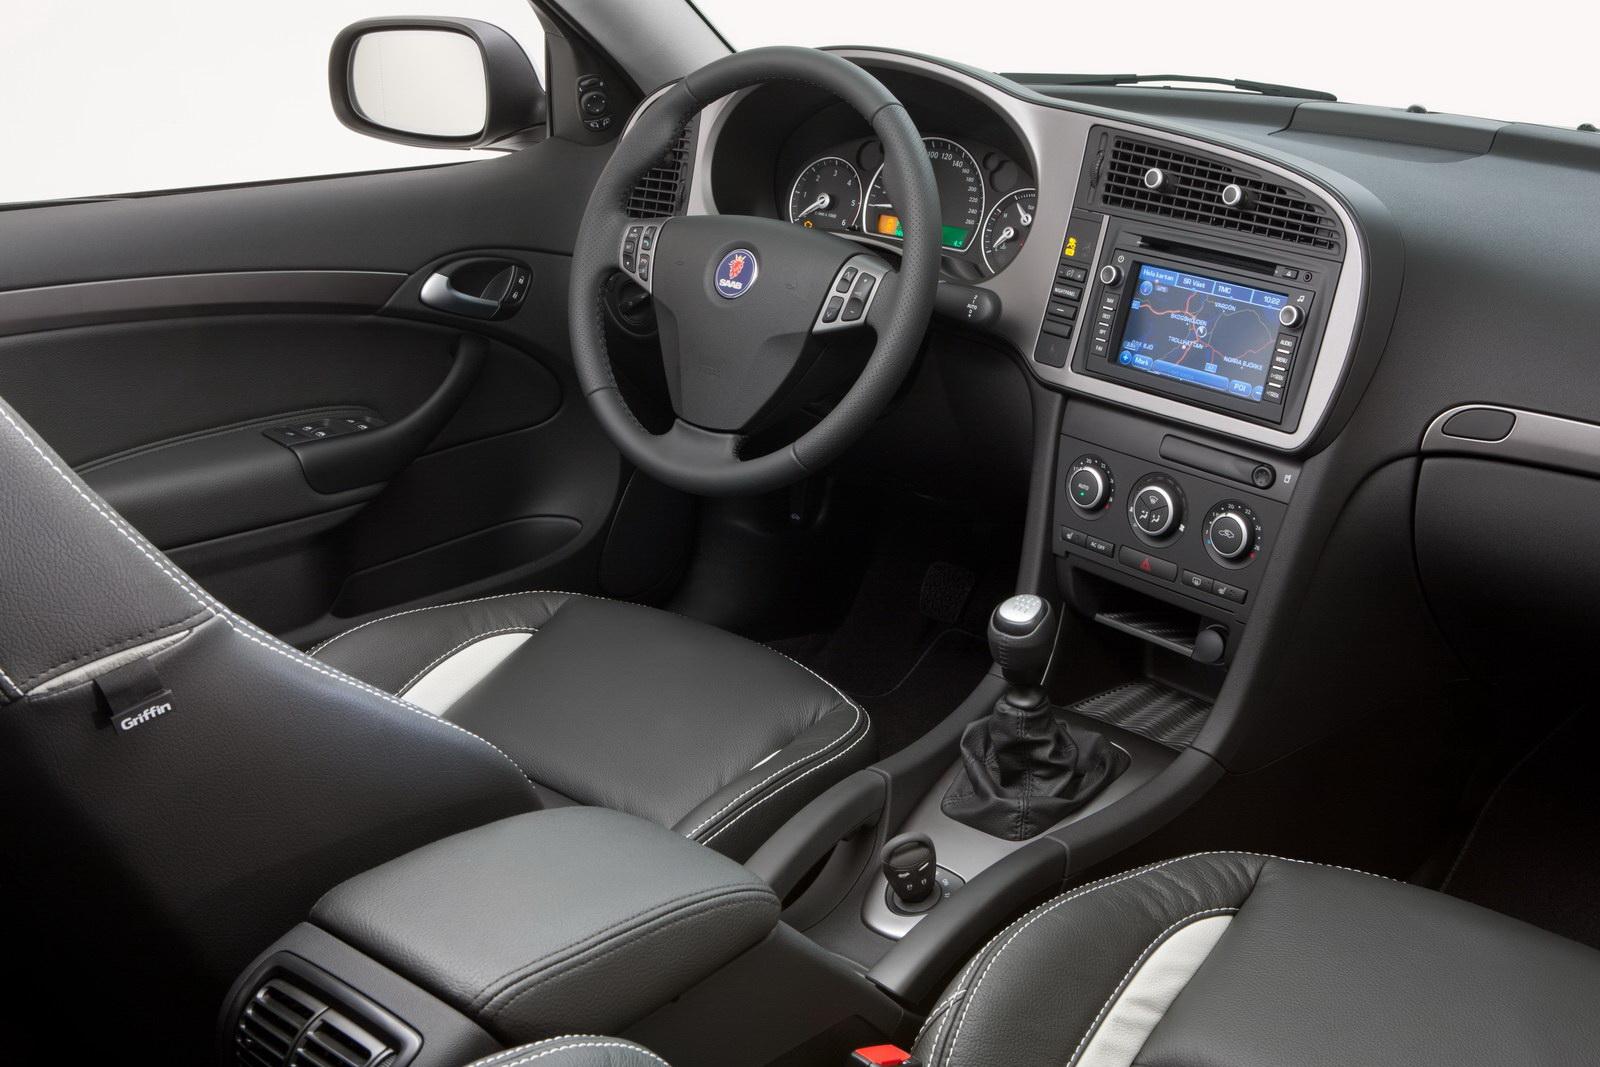 Saab Automobile and CATC signed a memorandumfot the import Saabs into China